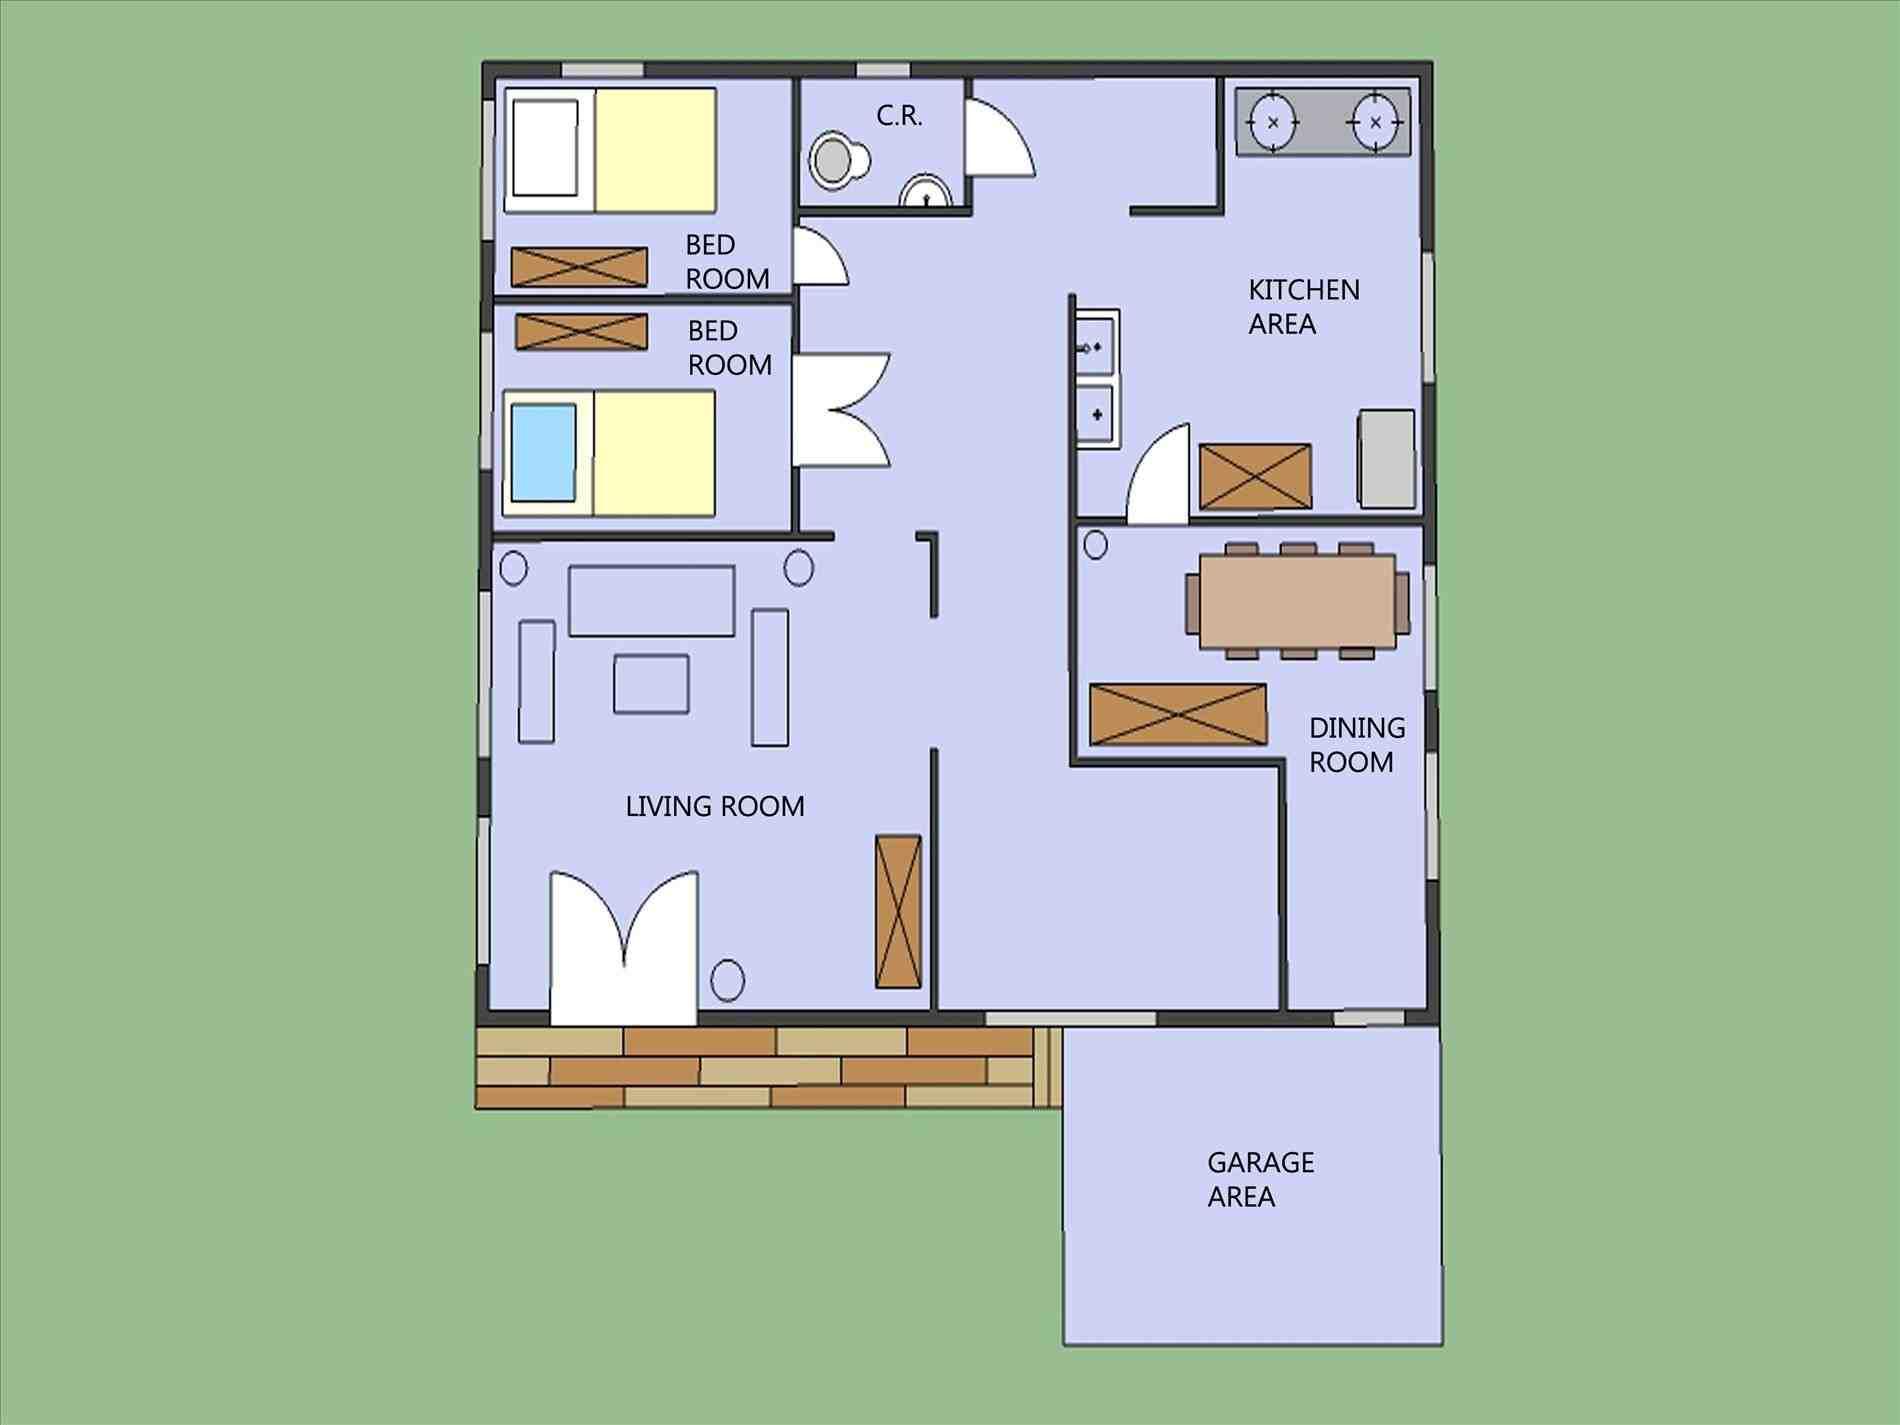 1900x1425 Modern Inside House Drawing